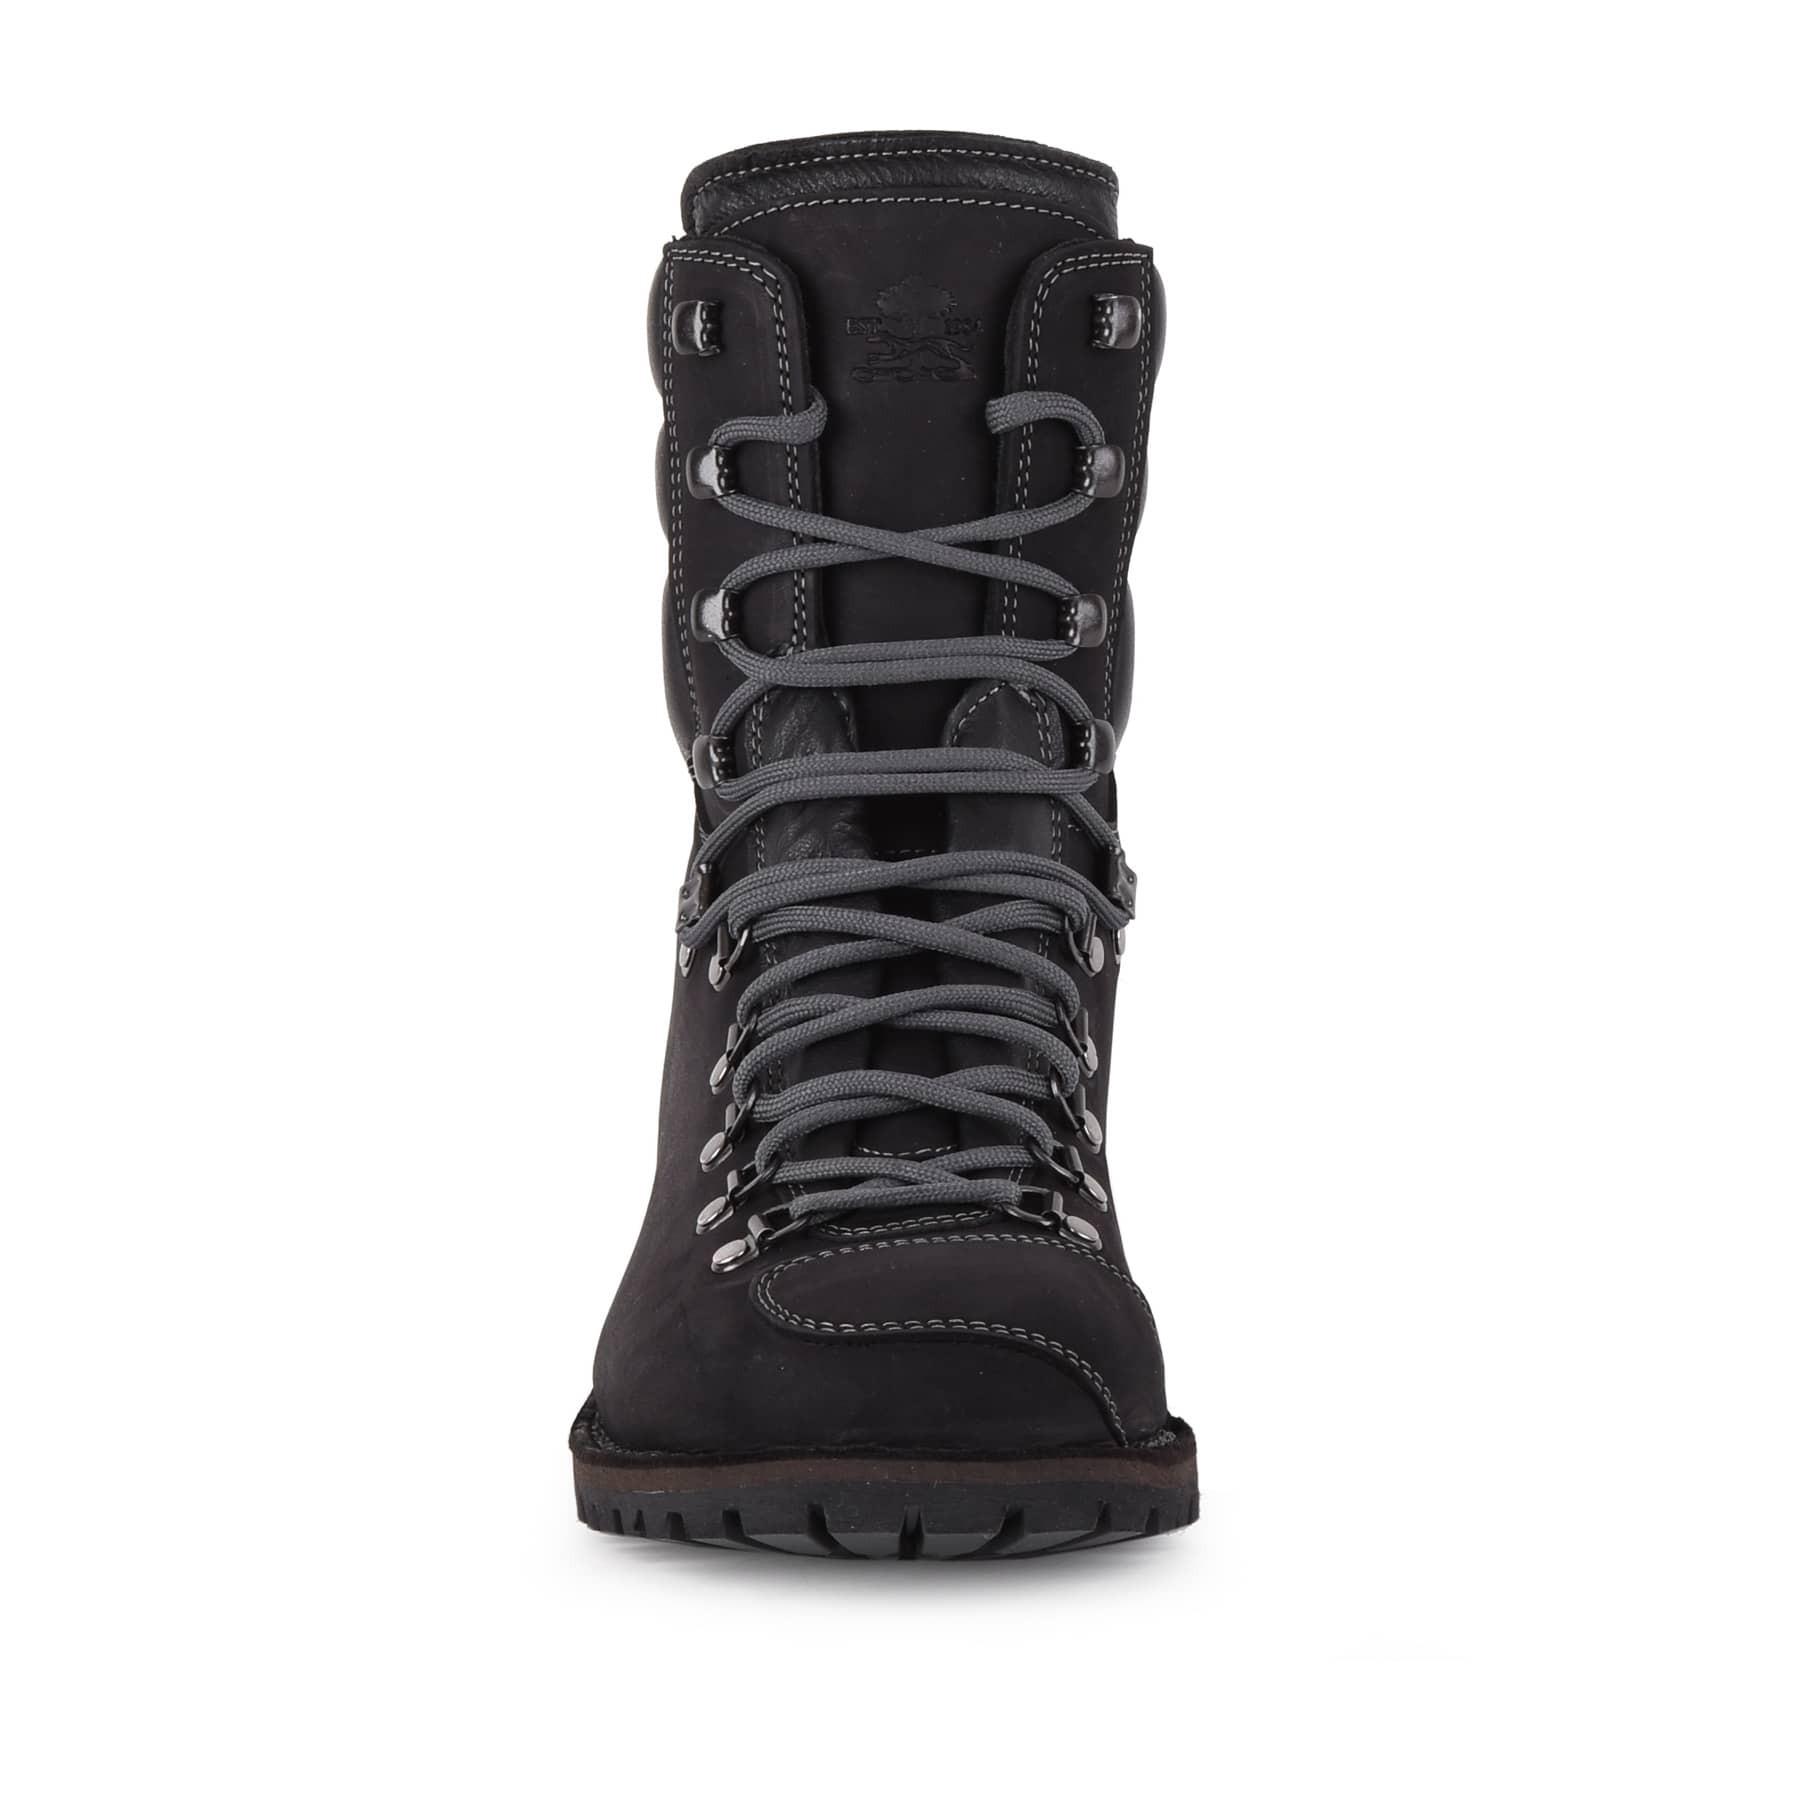 Biker Boot AdventureSE Denver Black, zwarte dames boot, grijs stiksel